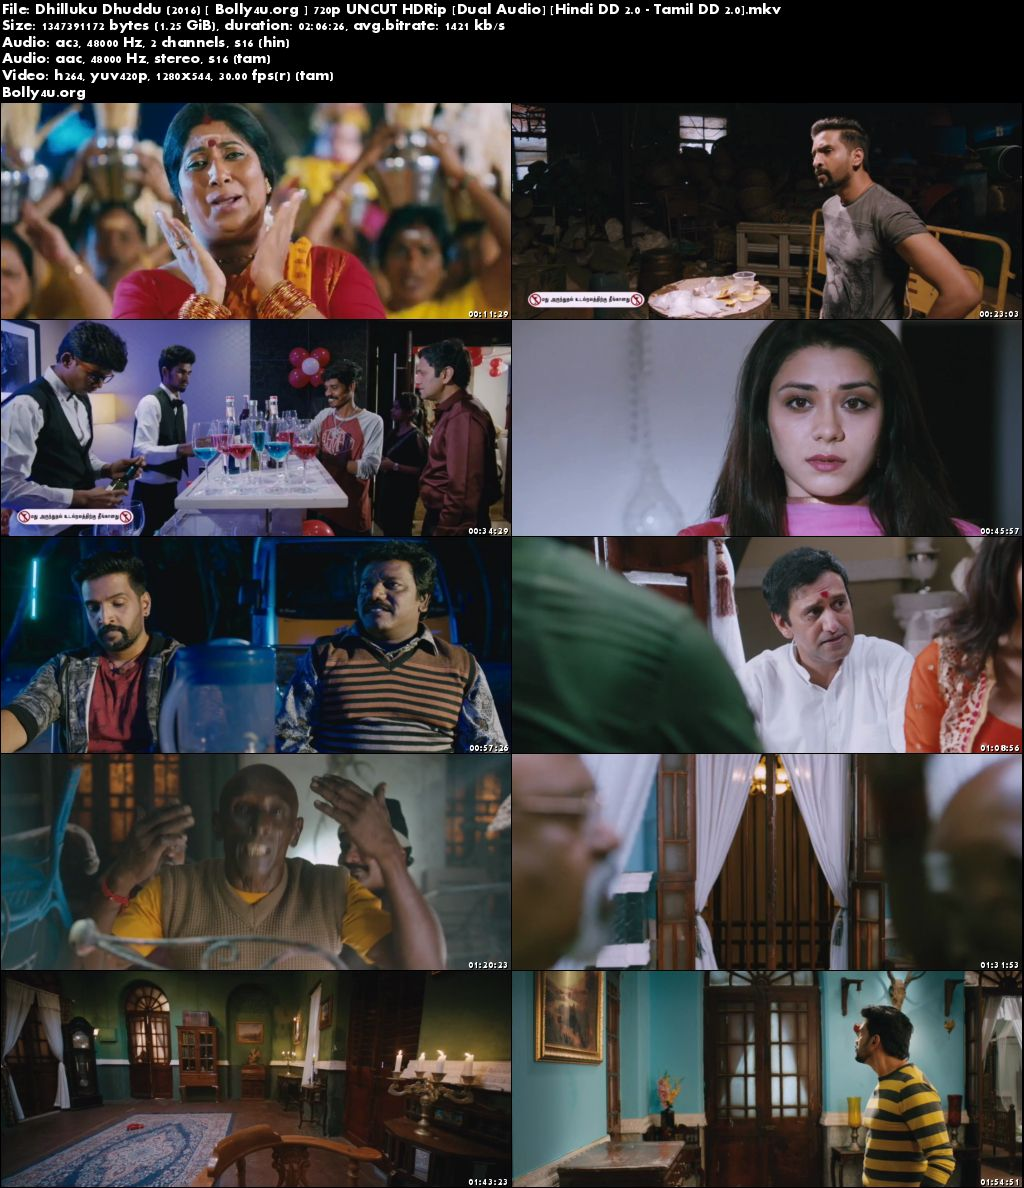 Dhilluku Dhuddu 2016 HDRip UNCUT Hindi Dubbed Dual Audio 720p Download